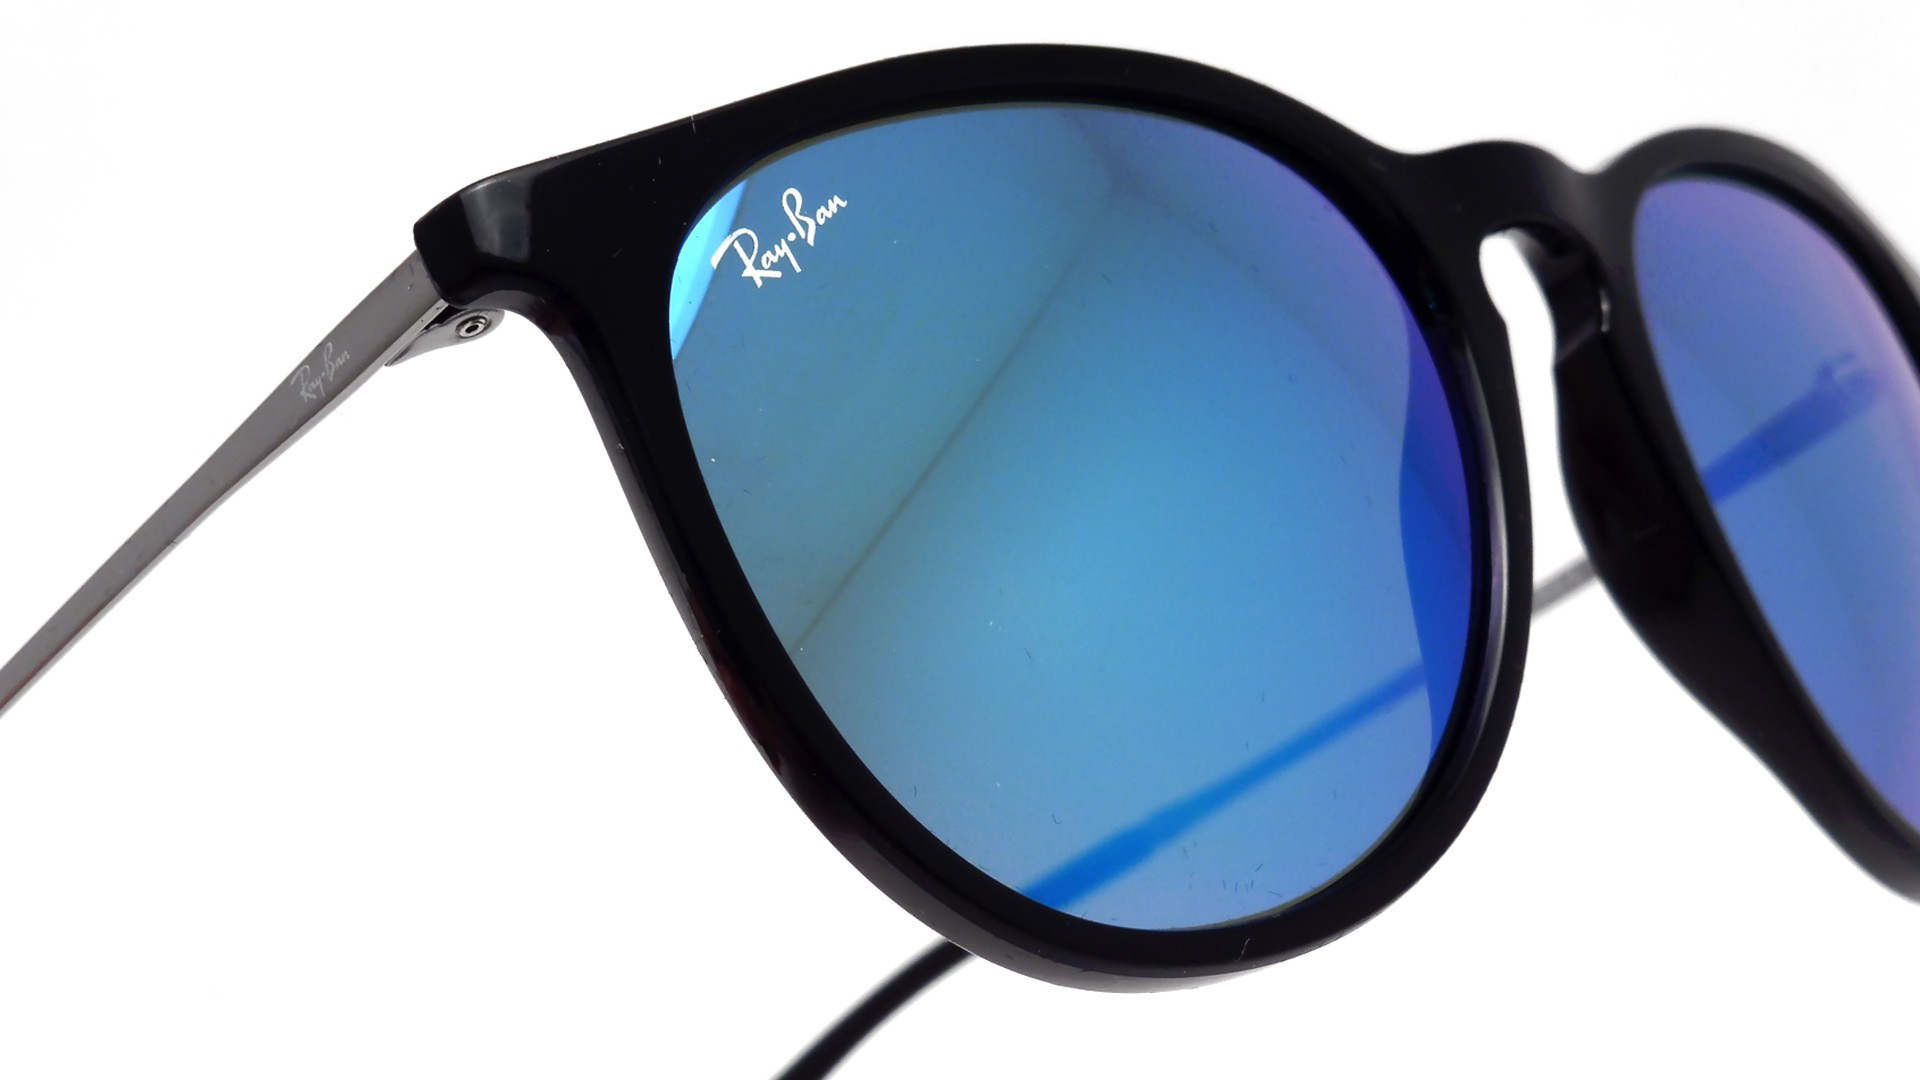 c848e9483b6 Sunglasses Ray-Ban Erika Black RB4171 601 55 54-18 Medium Mirror